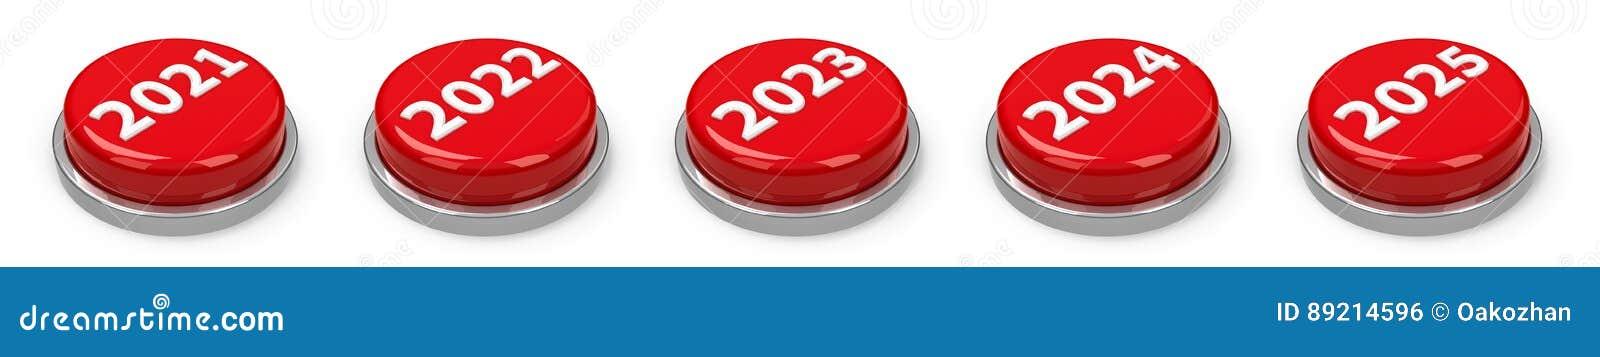 Boutons - 2021 2022 2023 2024 2025